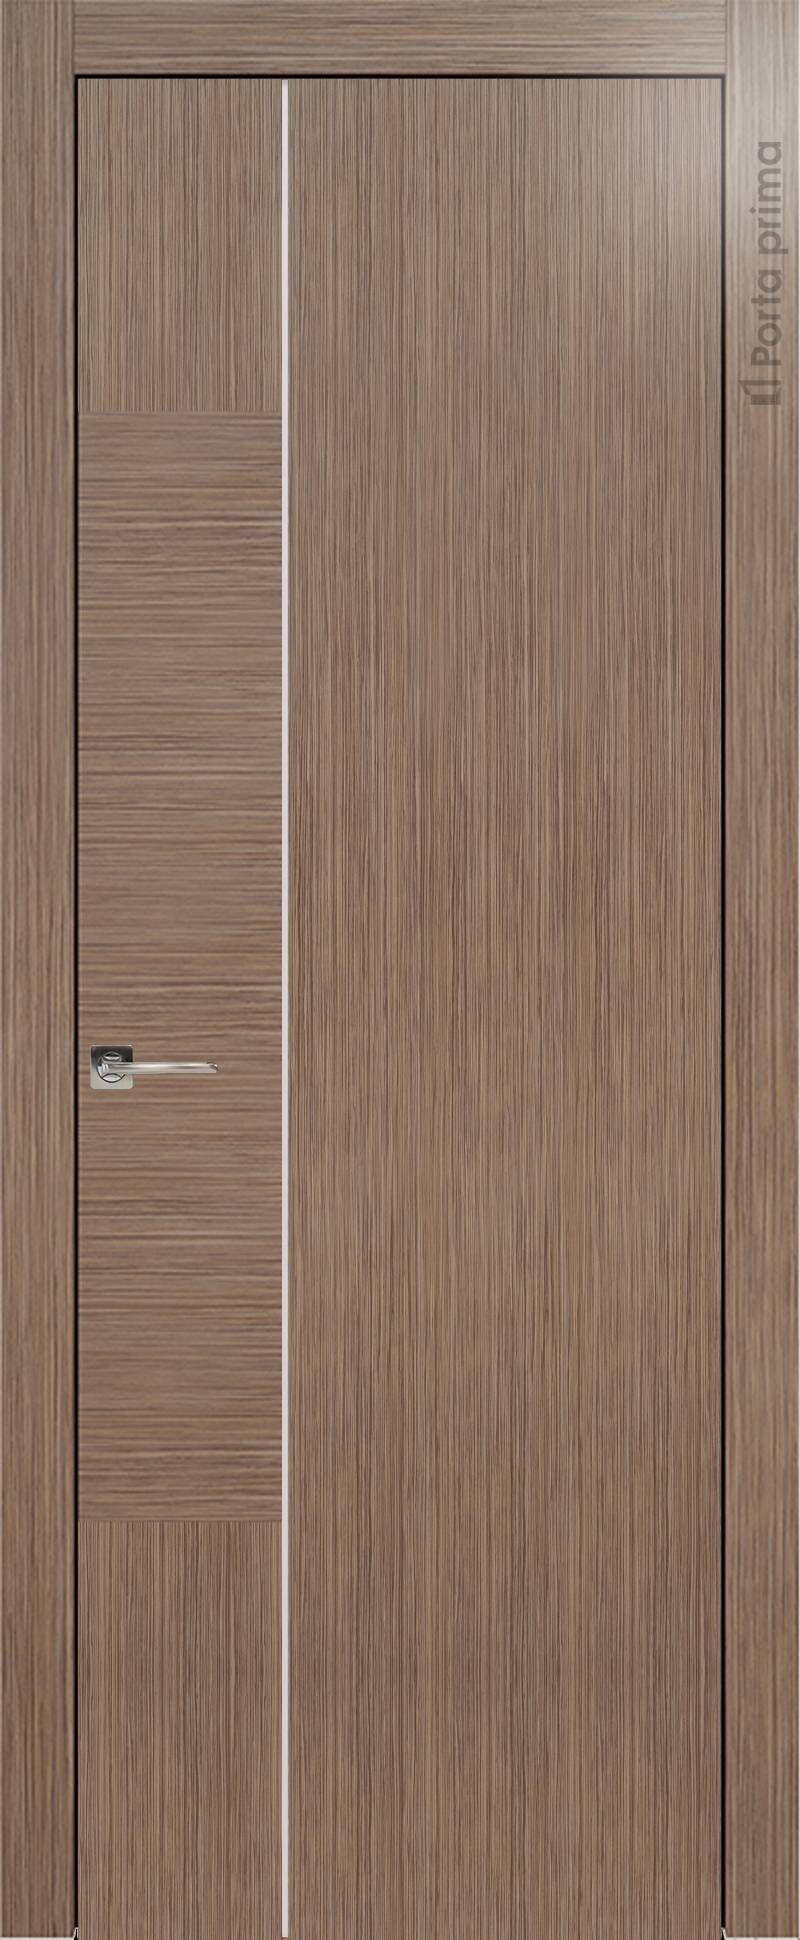 Tivoli В-1 цвет - Орех Без стекла (ДГ)